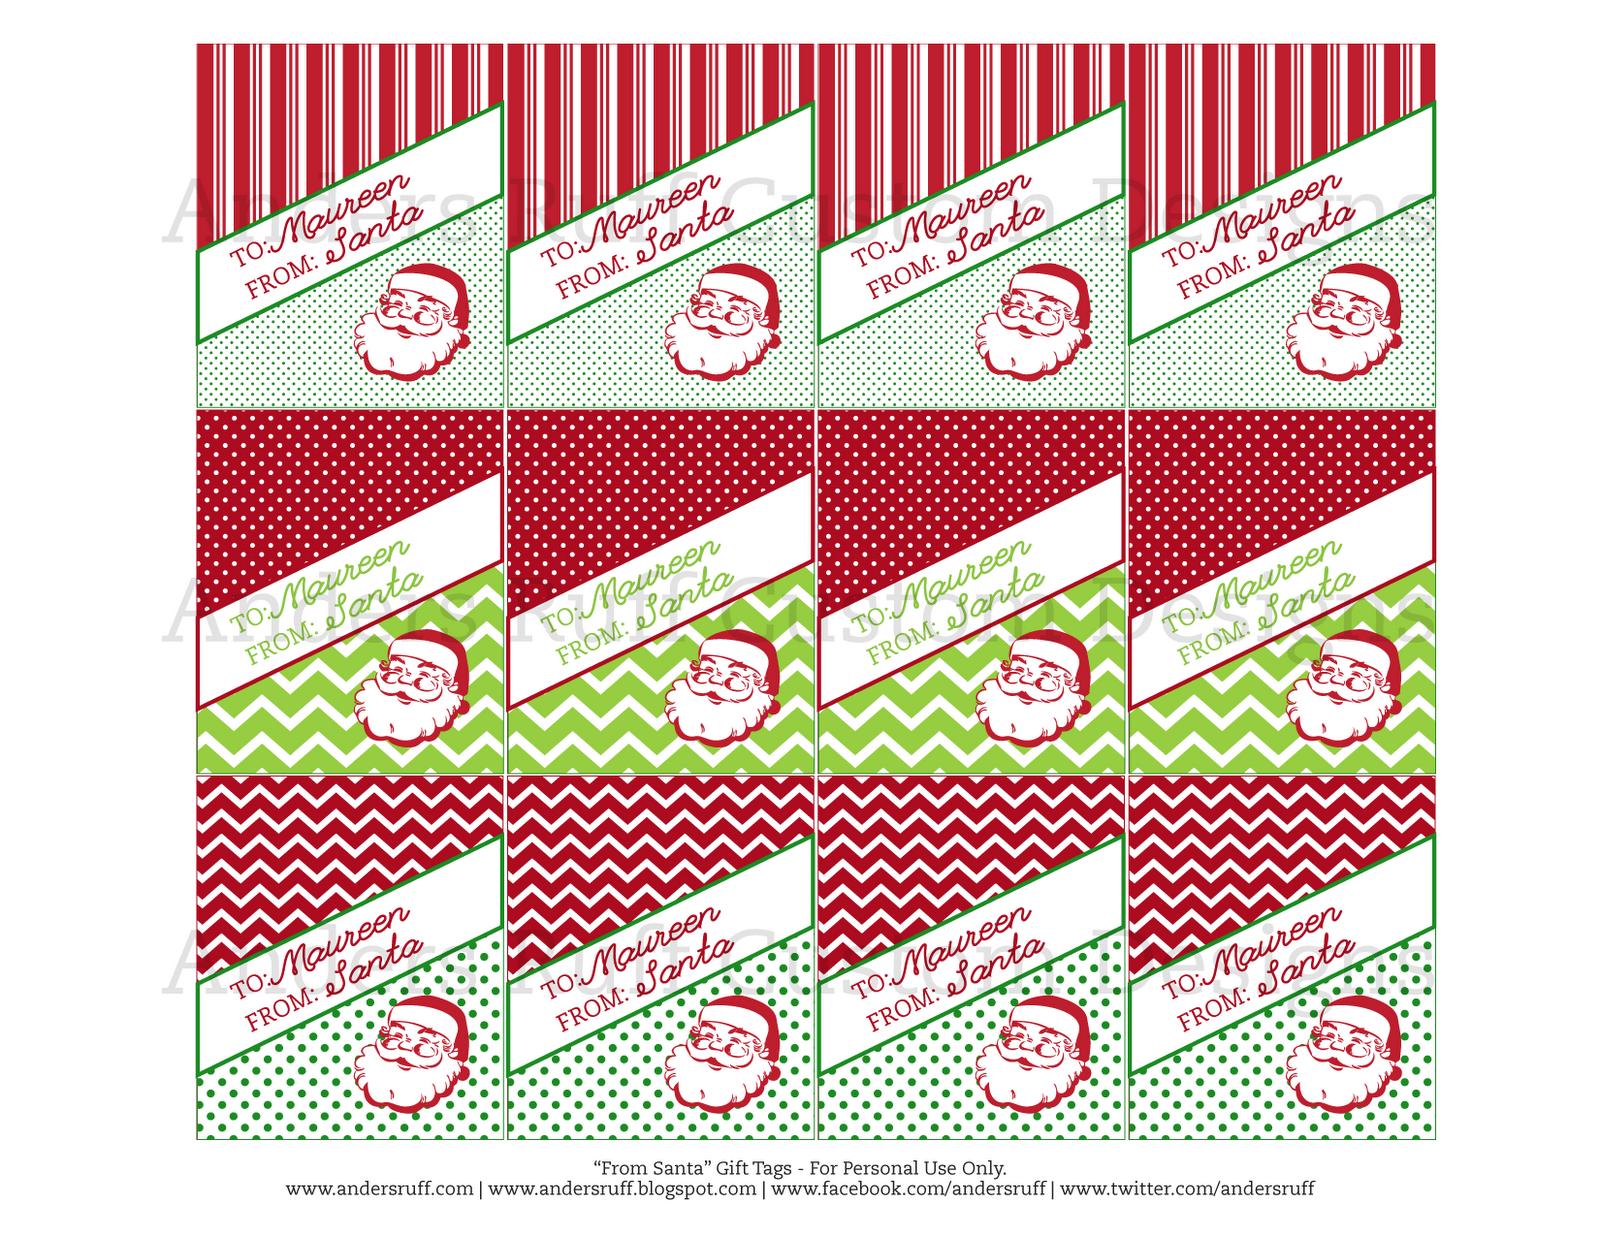 printable vintage from santa gift tags anders ruff custom